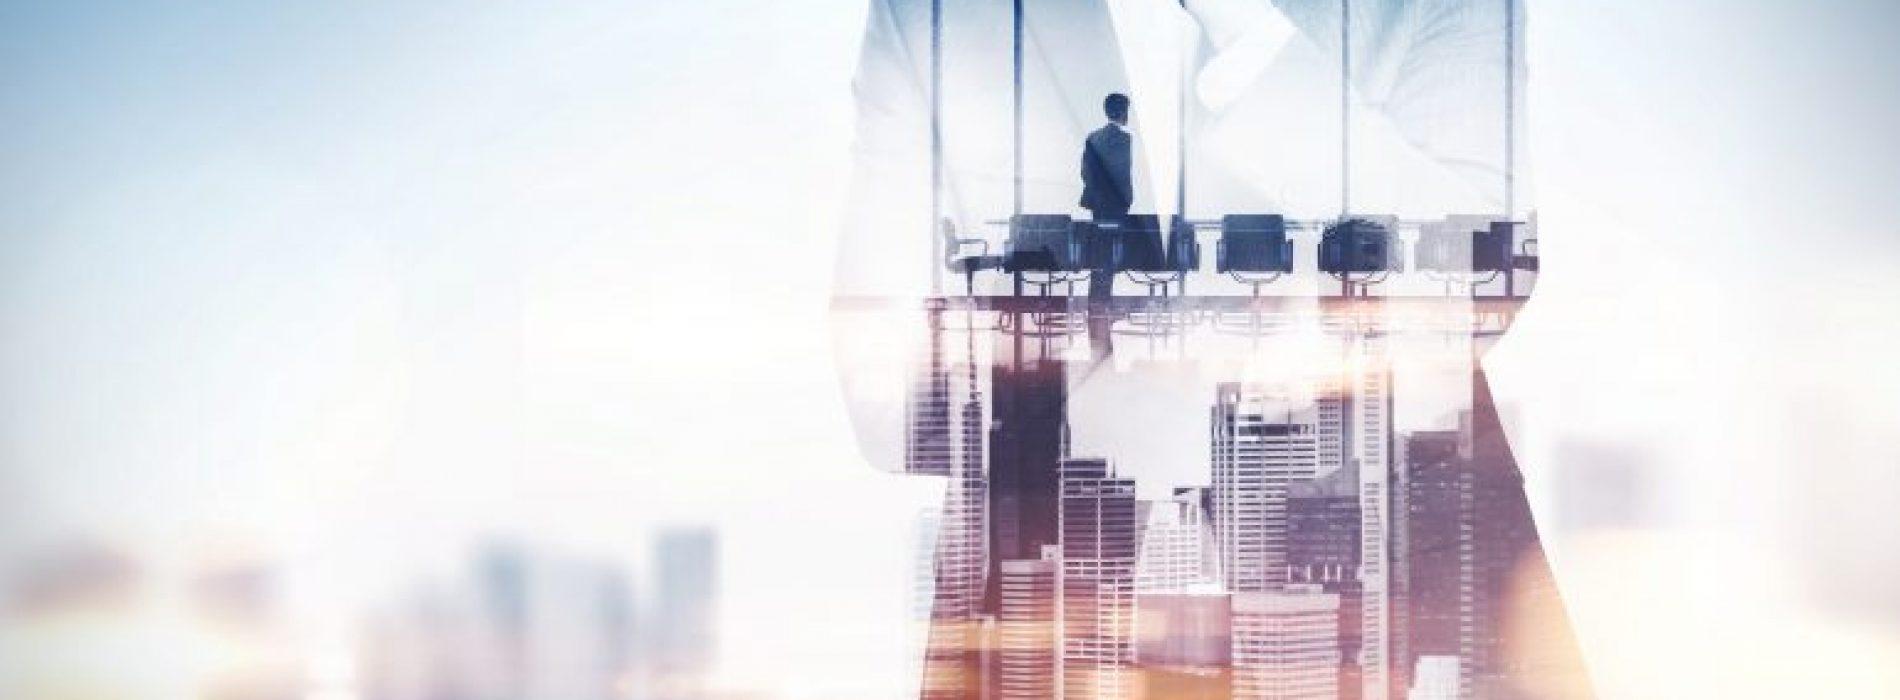 Is Dubai an Incubator for Small and Medium Businesses?